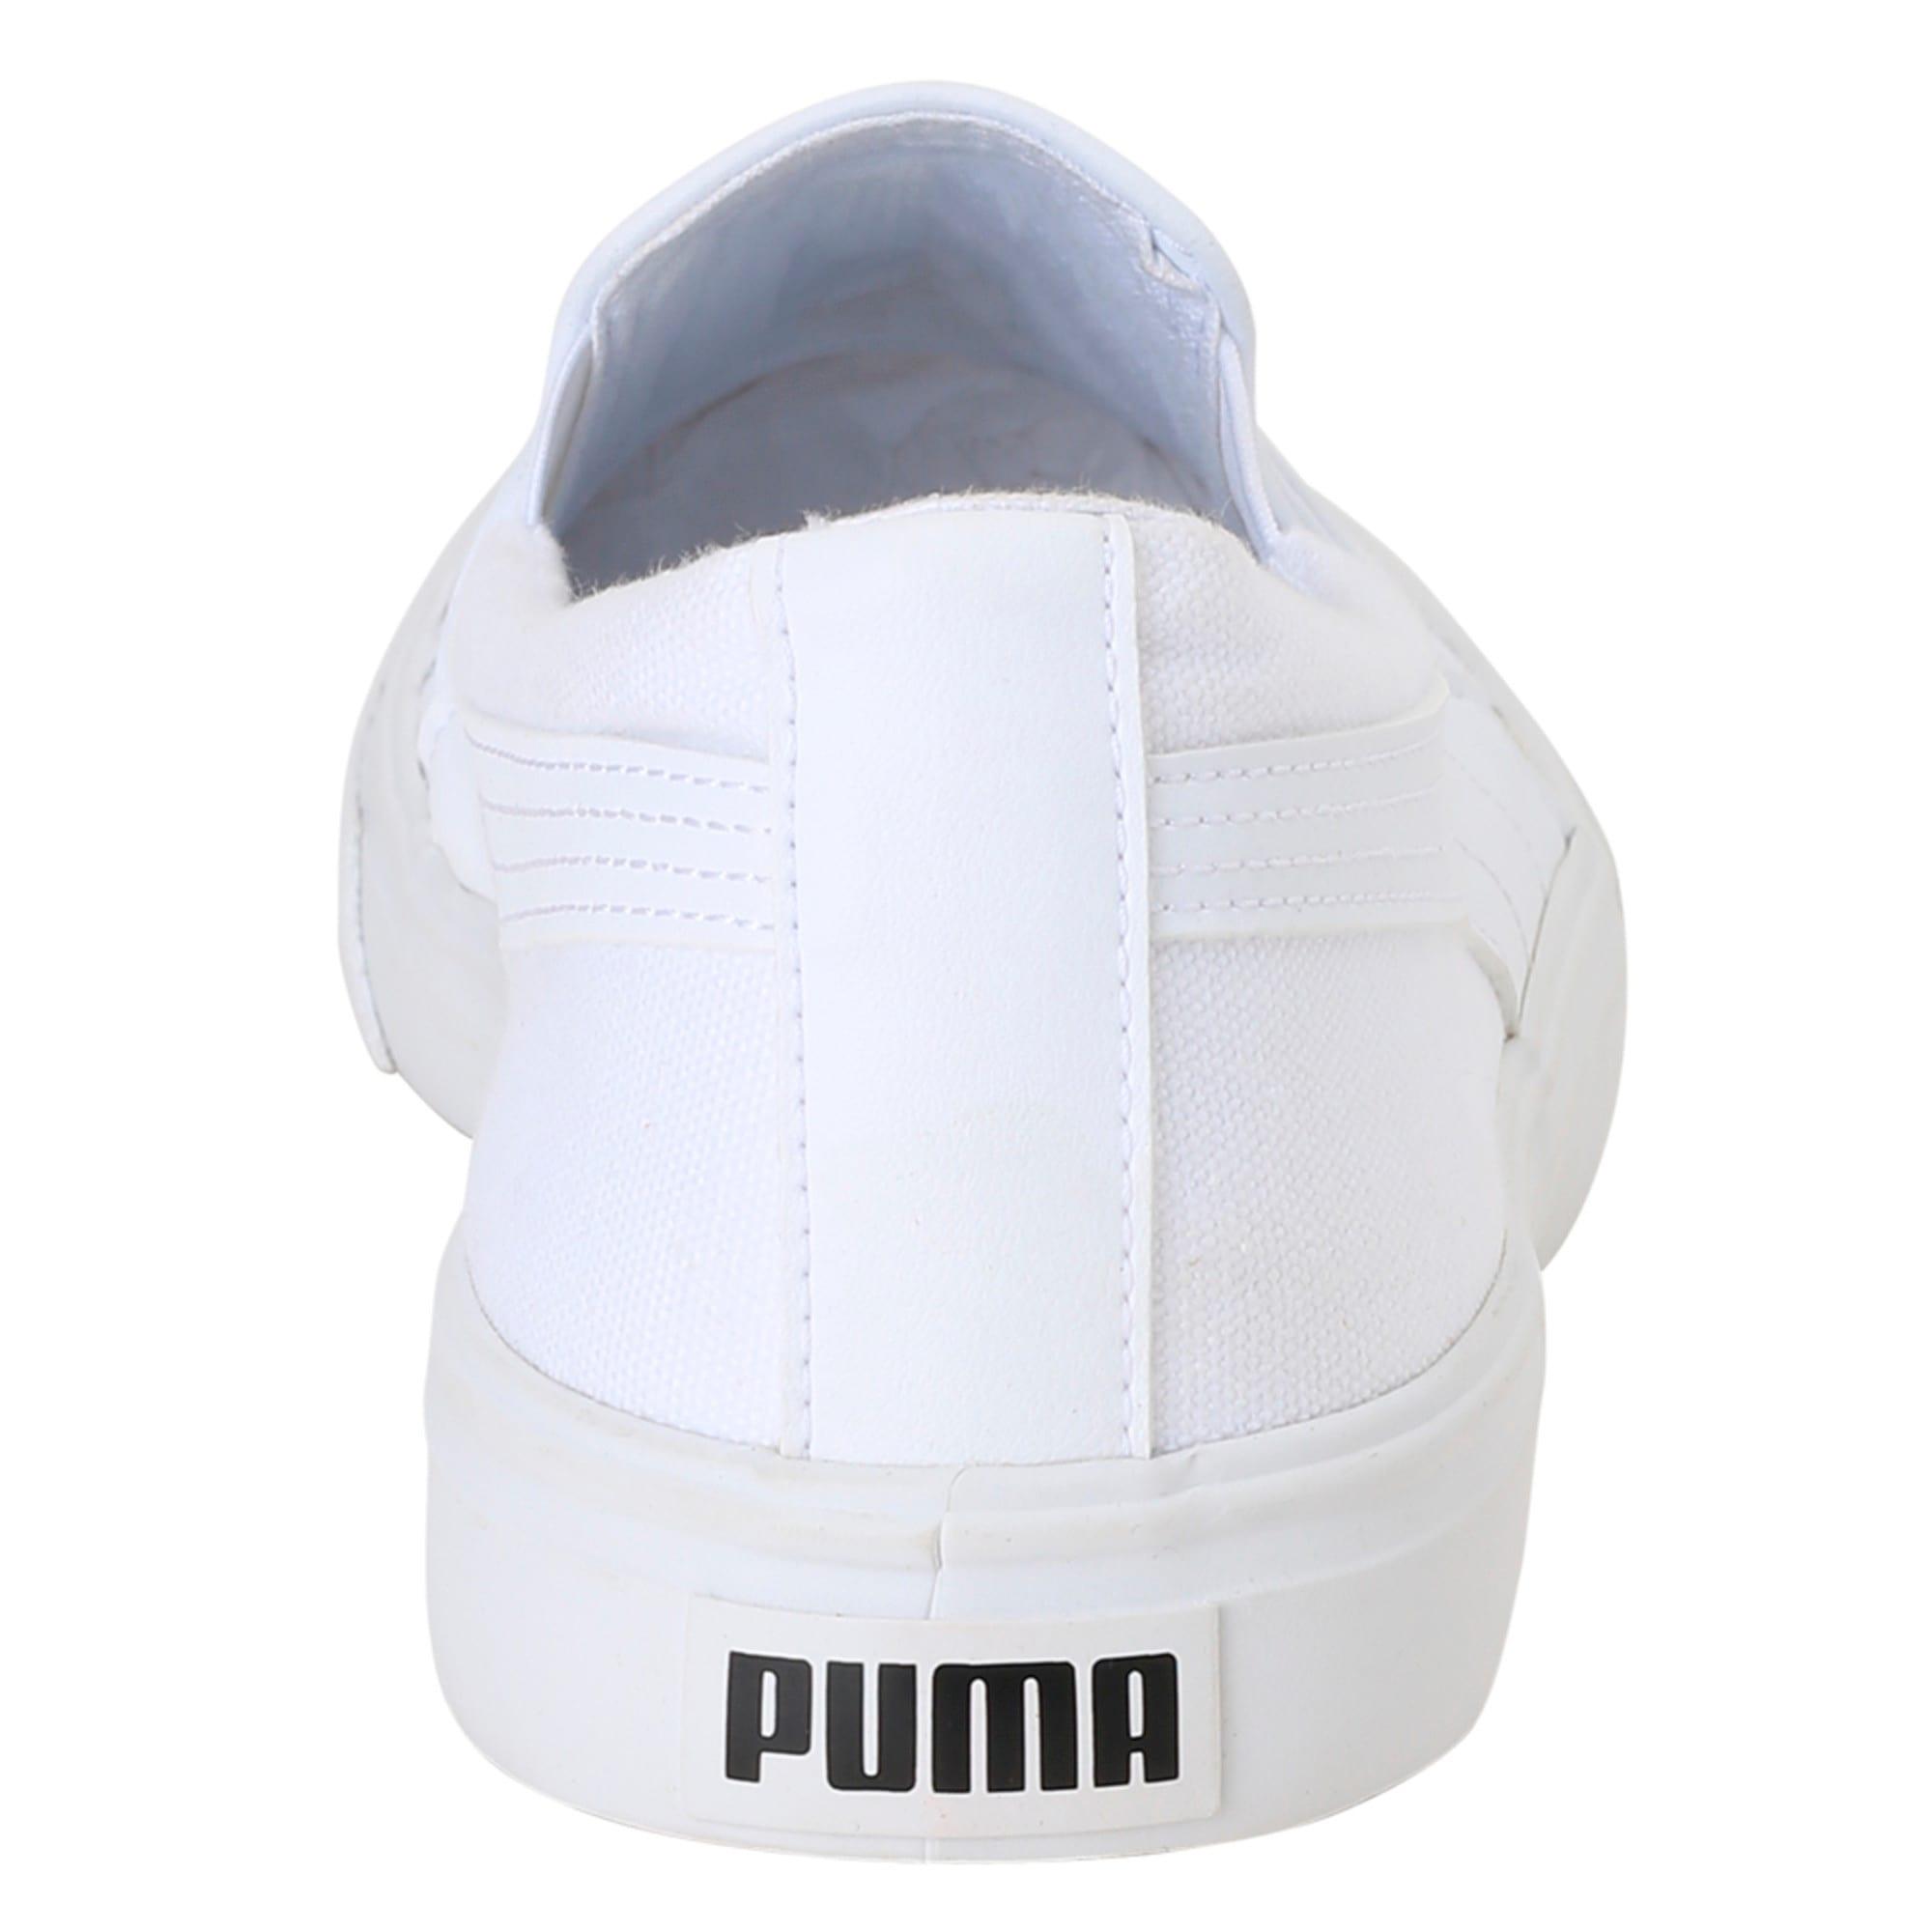 Thumbnail 4 of Puma One8 Slip-on, White-Black-Bleu Azur, medium-IND